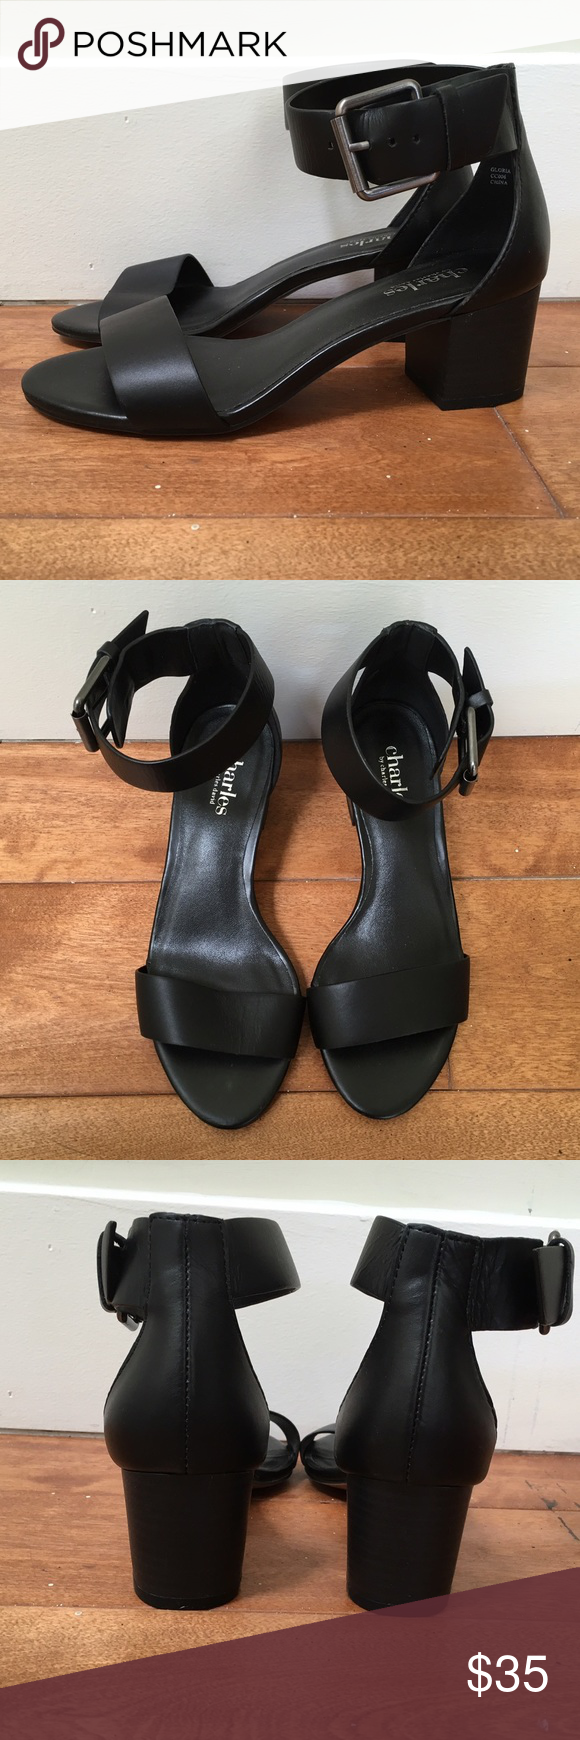 Black sandals 2 inch heel - Charles David Black Strap Sandals 2 Inch Heelscharles